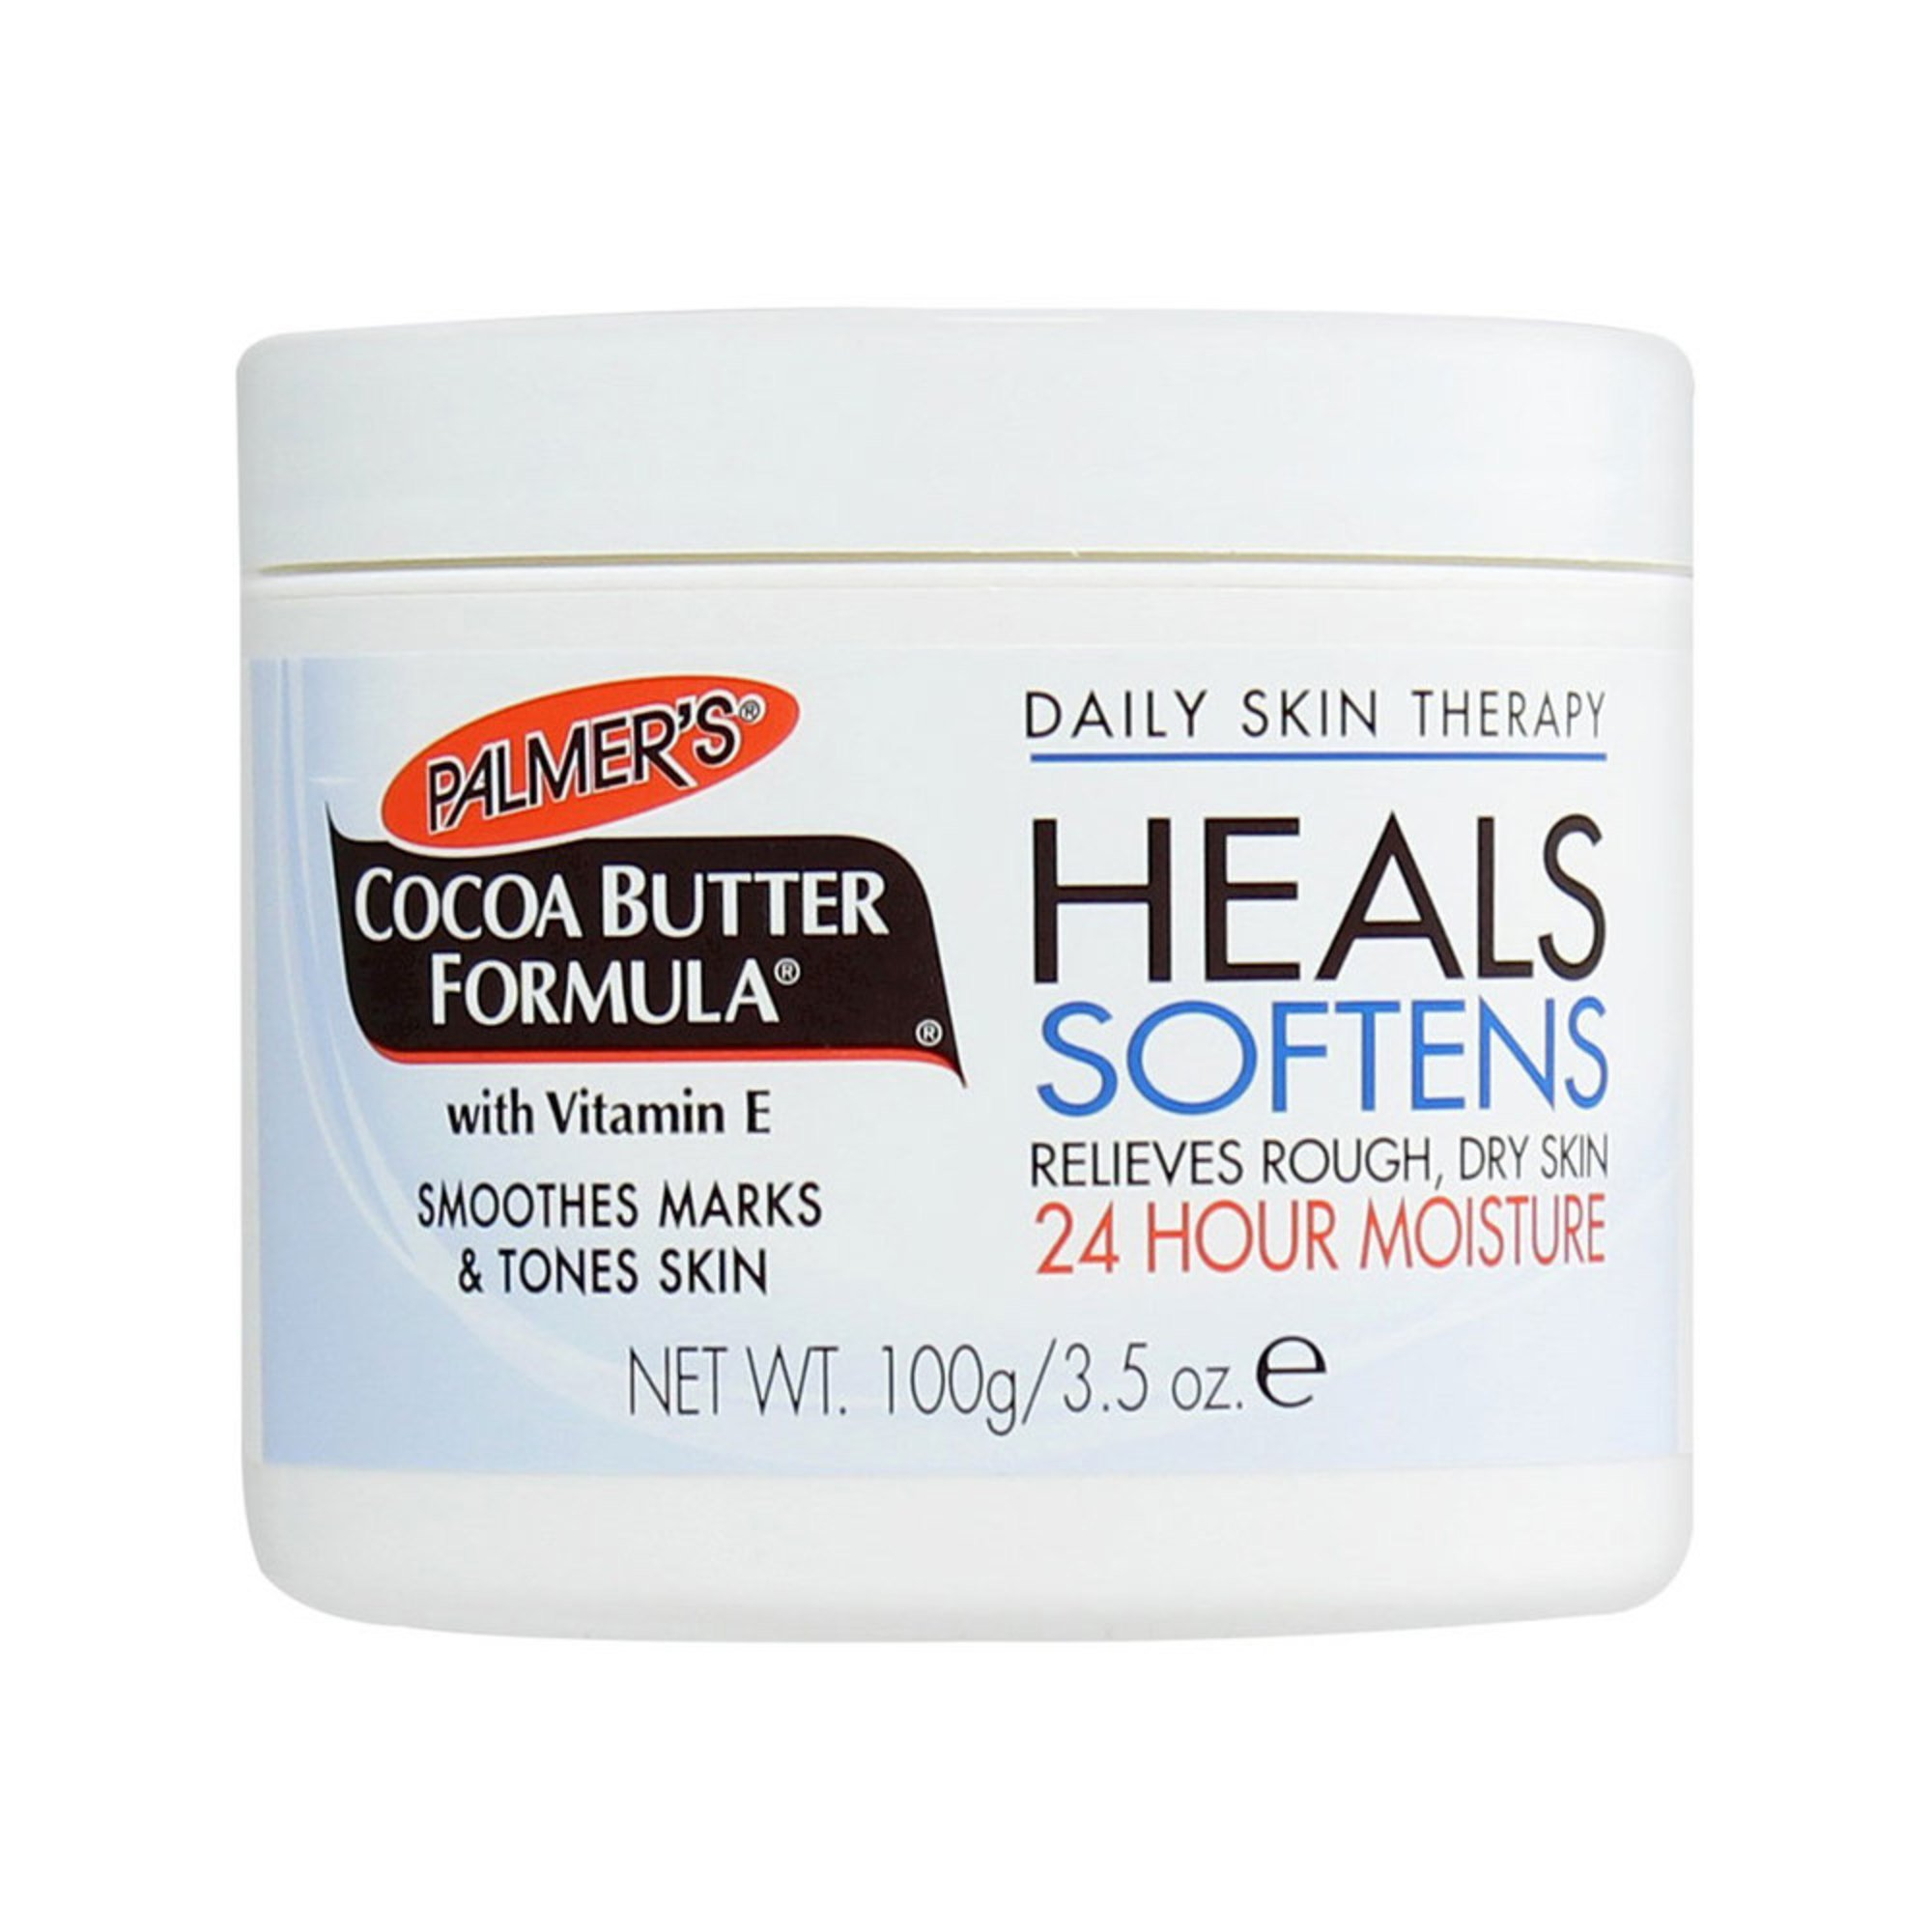 702877d4e06 Palmer's Cocoa Butter Jar 3.5oz | Skincare | Health & Beauty - Shop ...